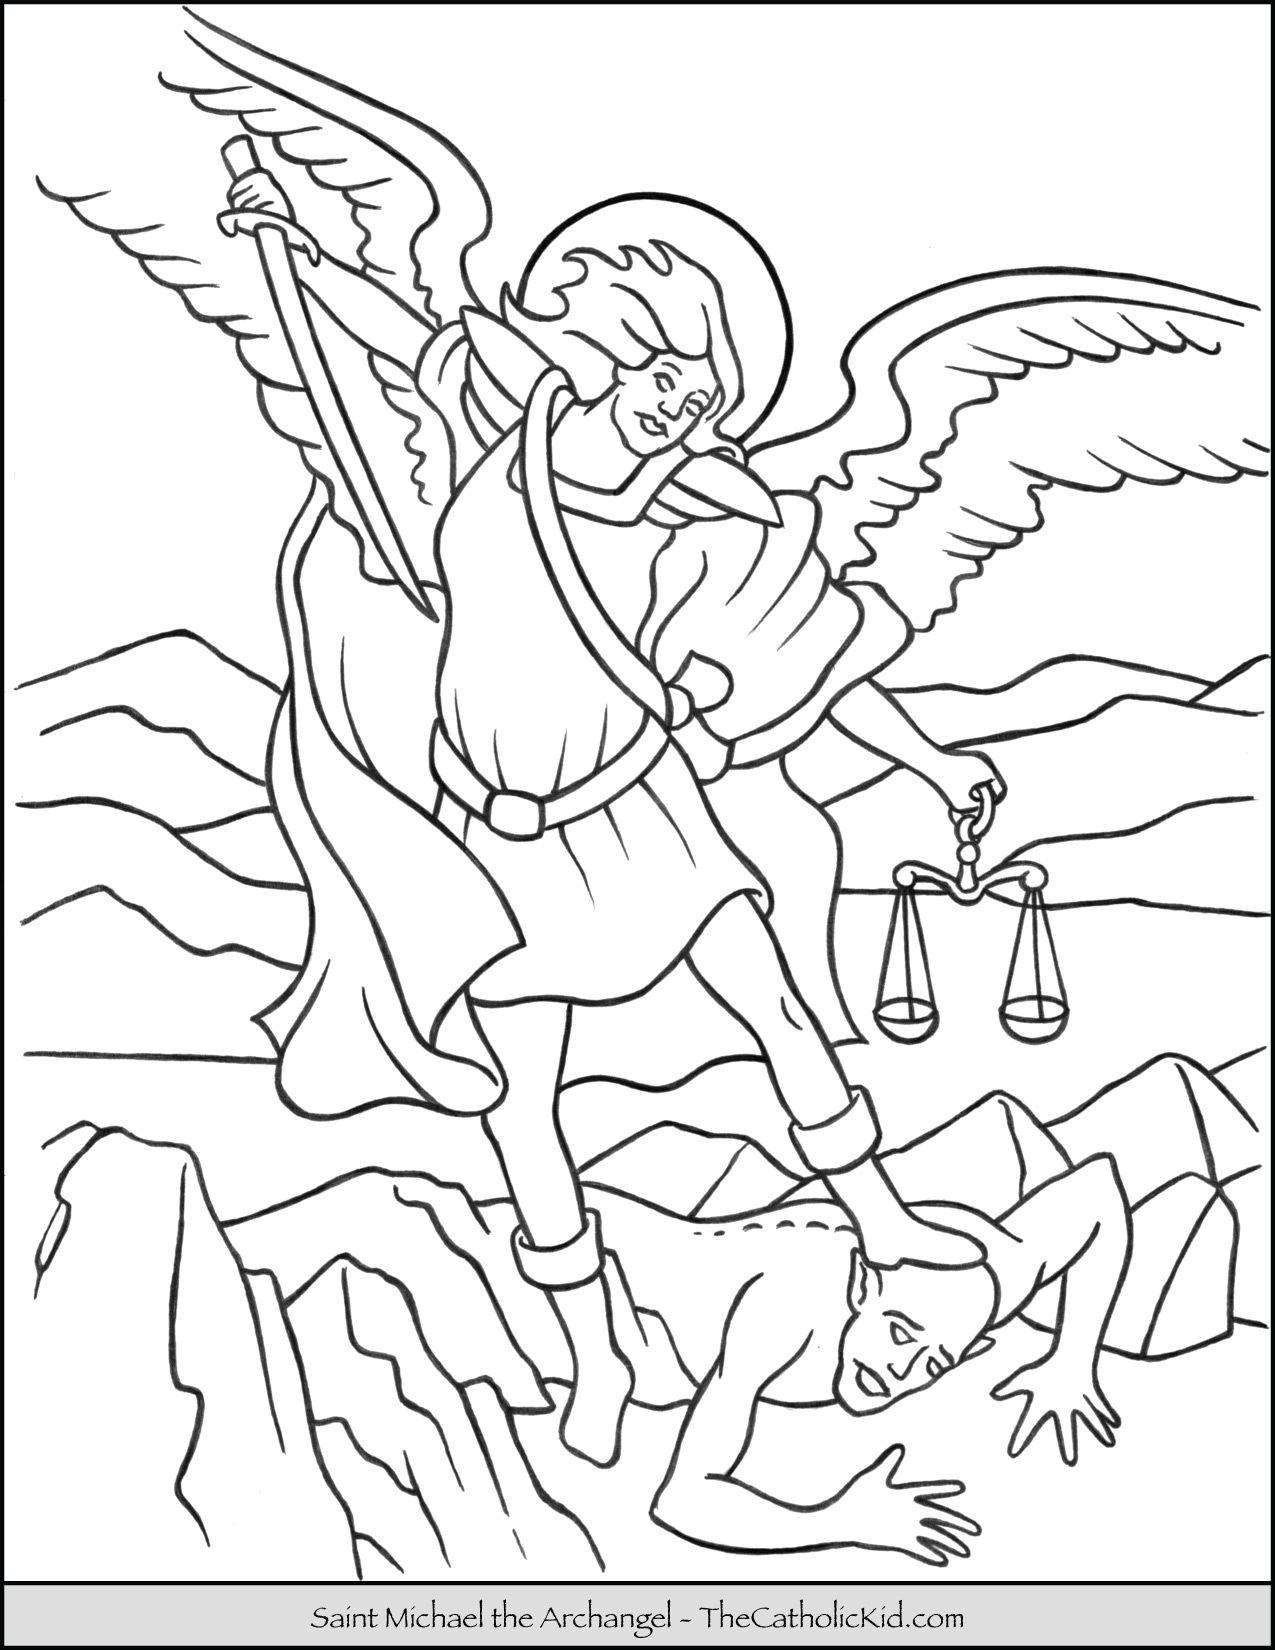 Saint Michael Archangel Coloring Page   Catholic Coloring